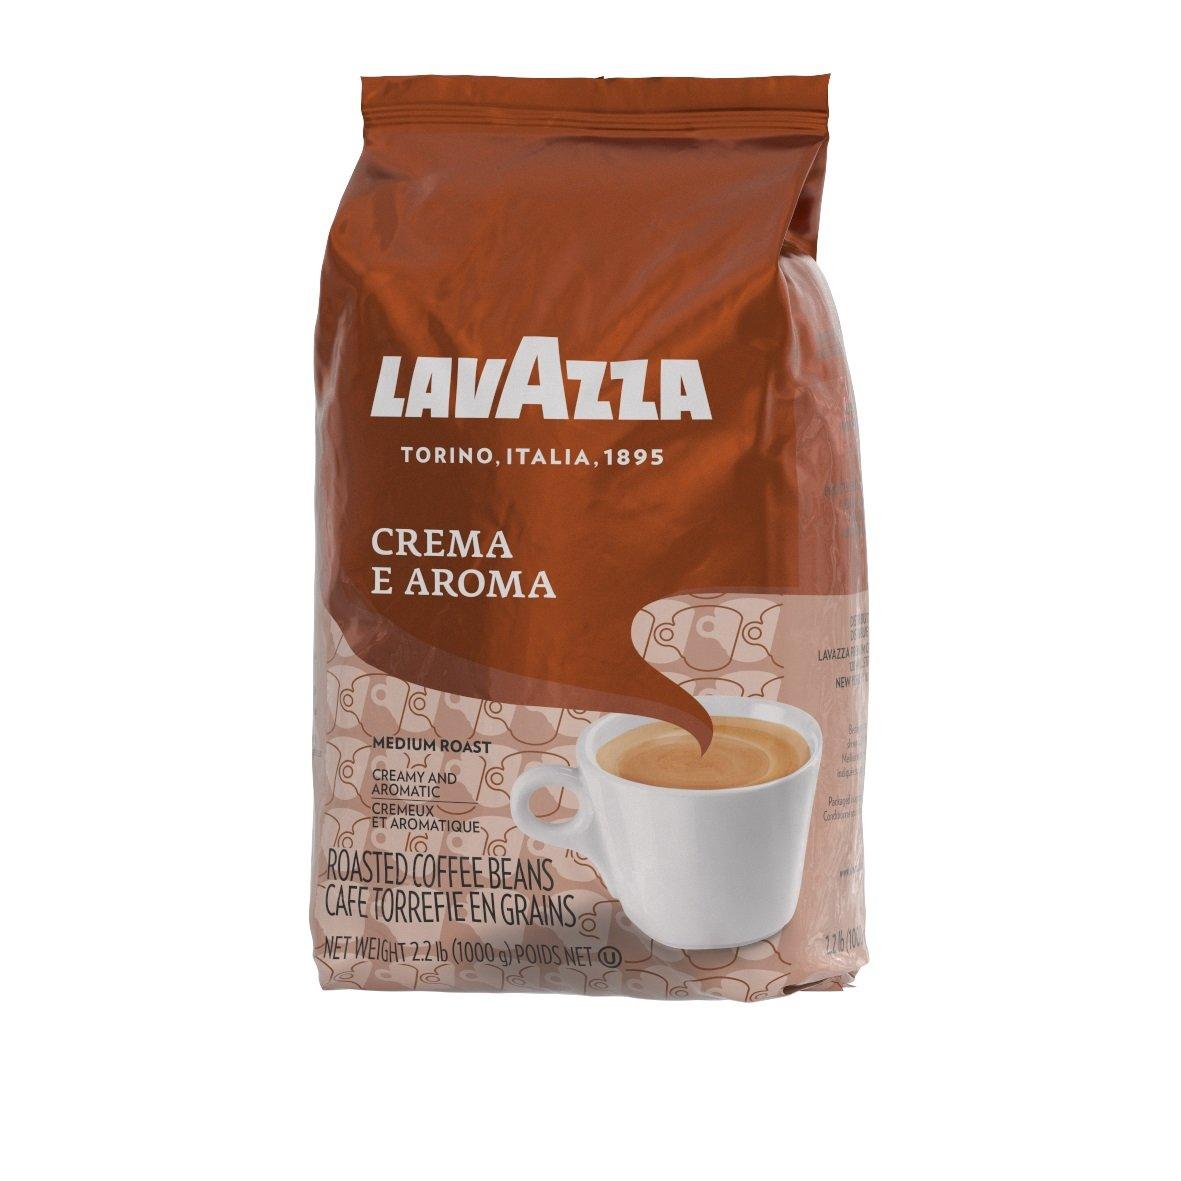 Lavazza Crema e Aroma Whole Bean Coffee Blend, Medium Roast, 2.2-Pound Bag $12.99 + FS w/ Prime @ Amazon